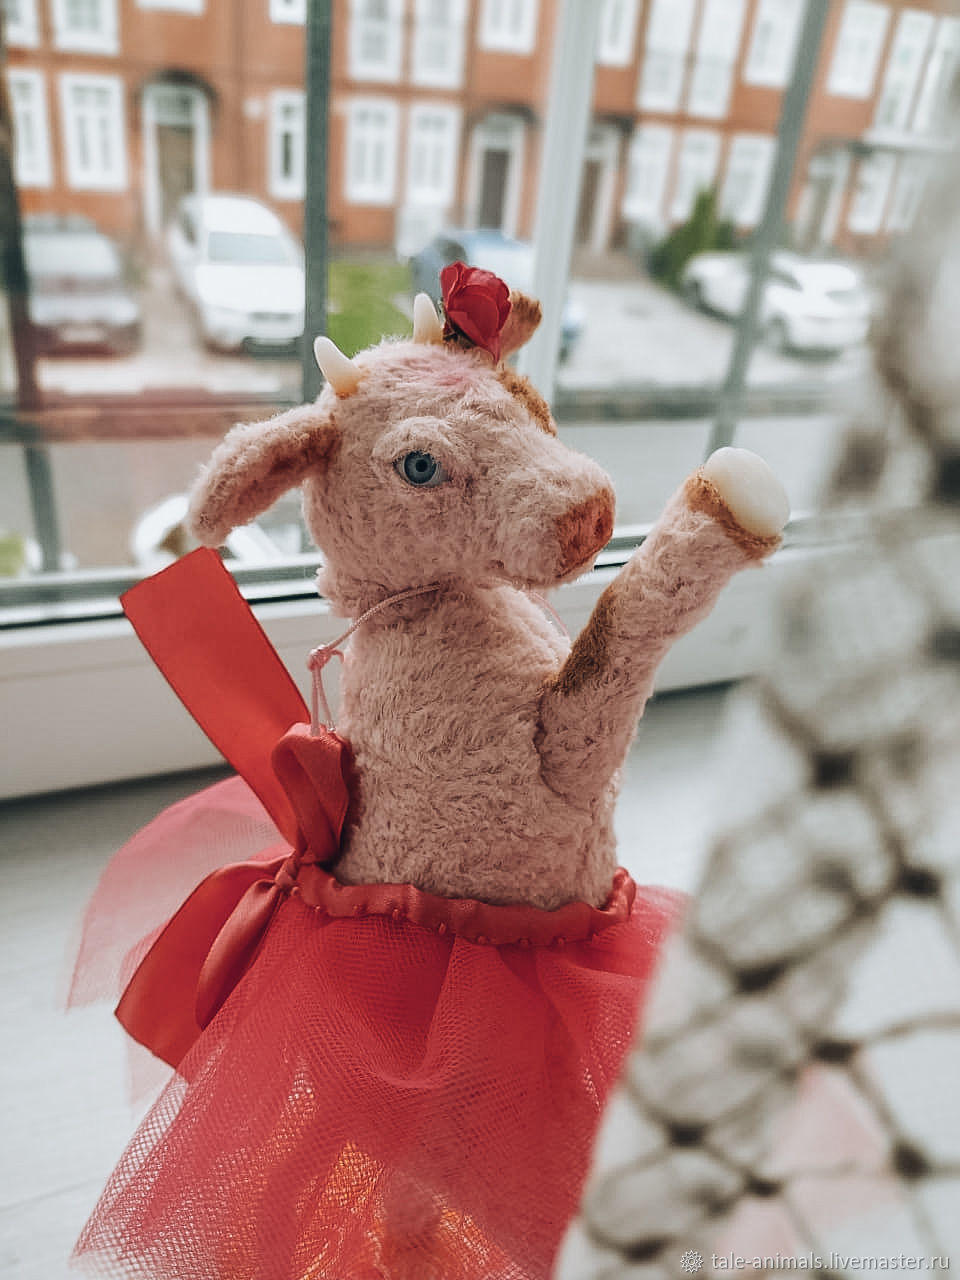 Toy Calf - ballerina, Teddy Toys, Moscow,  Фото №1